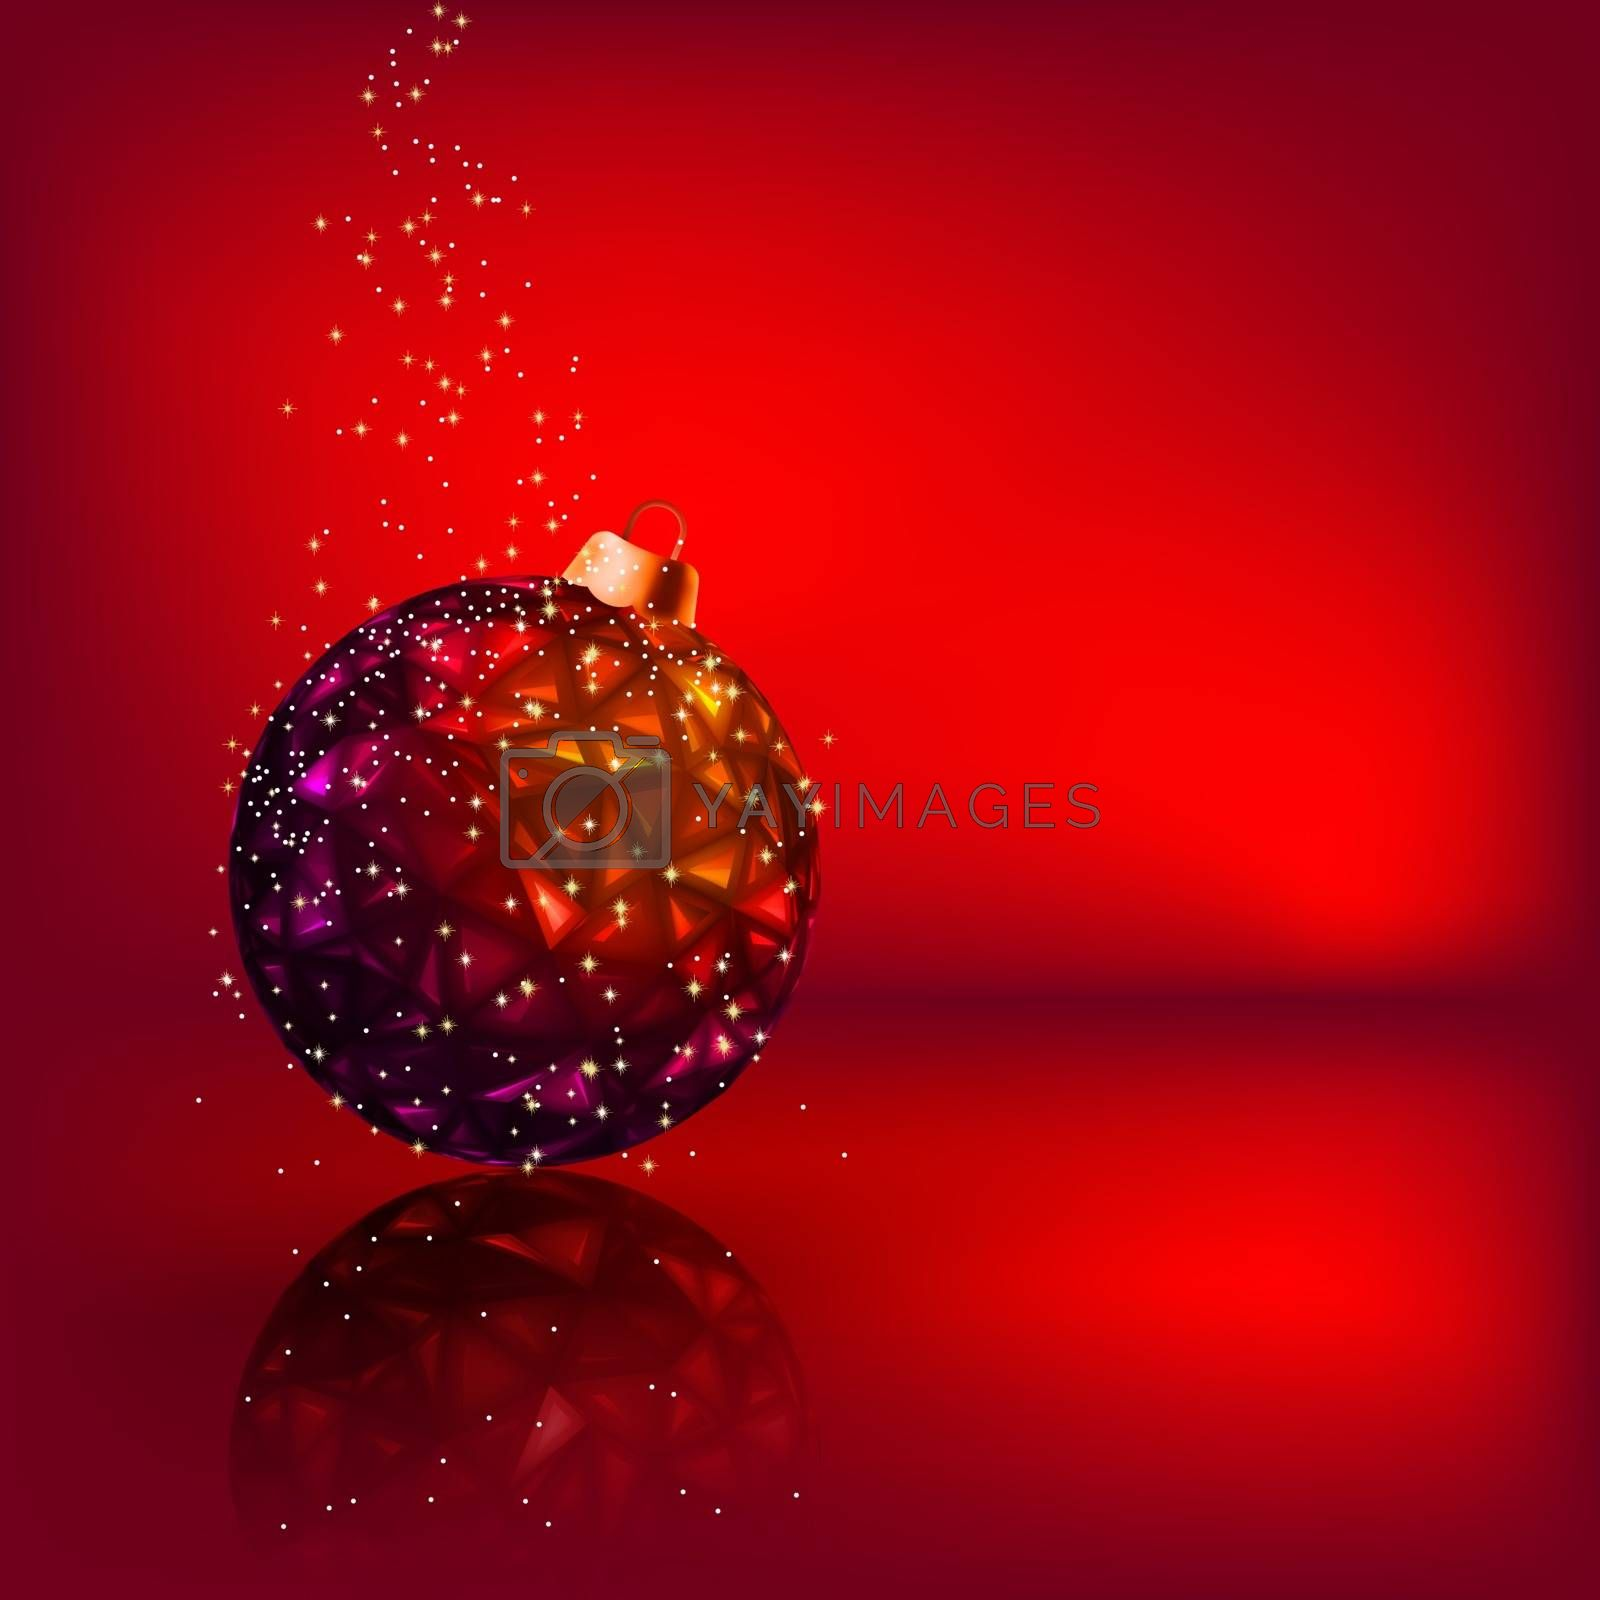 Christmas card with stars Christmas ball. EPS 8 by Petrov_Vladimir